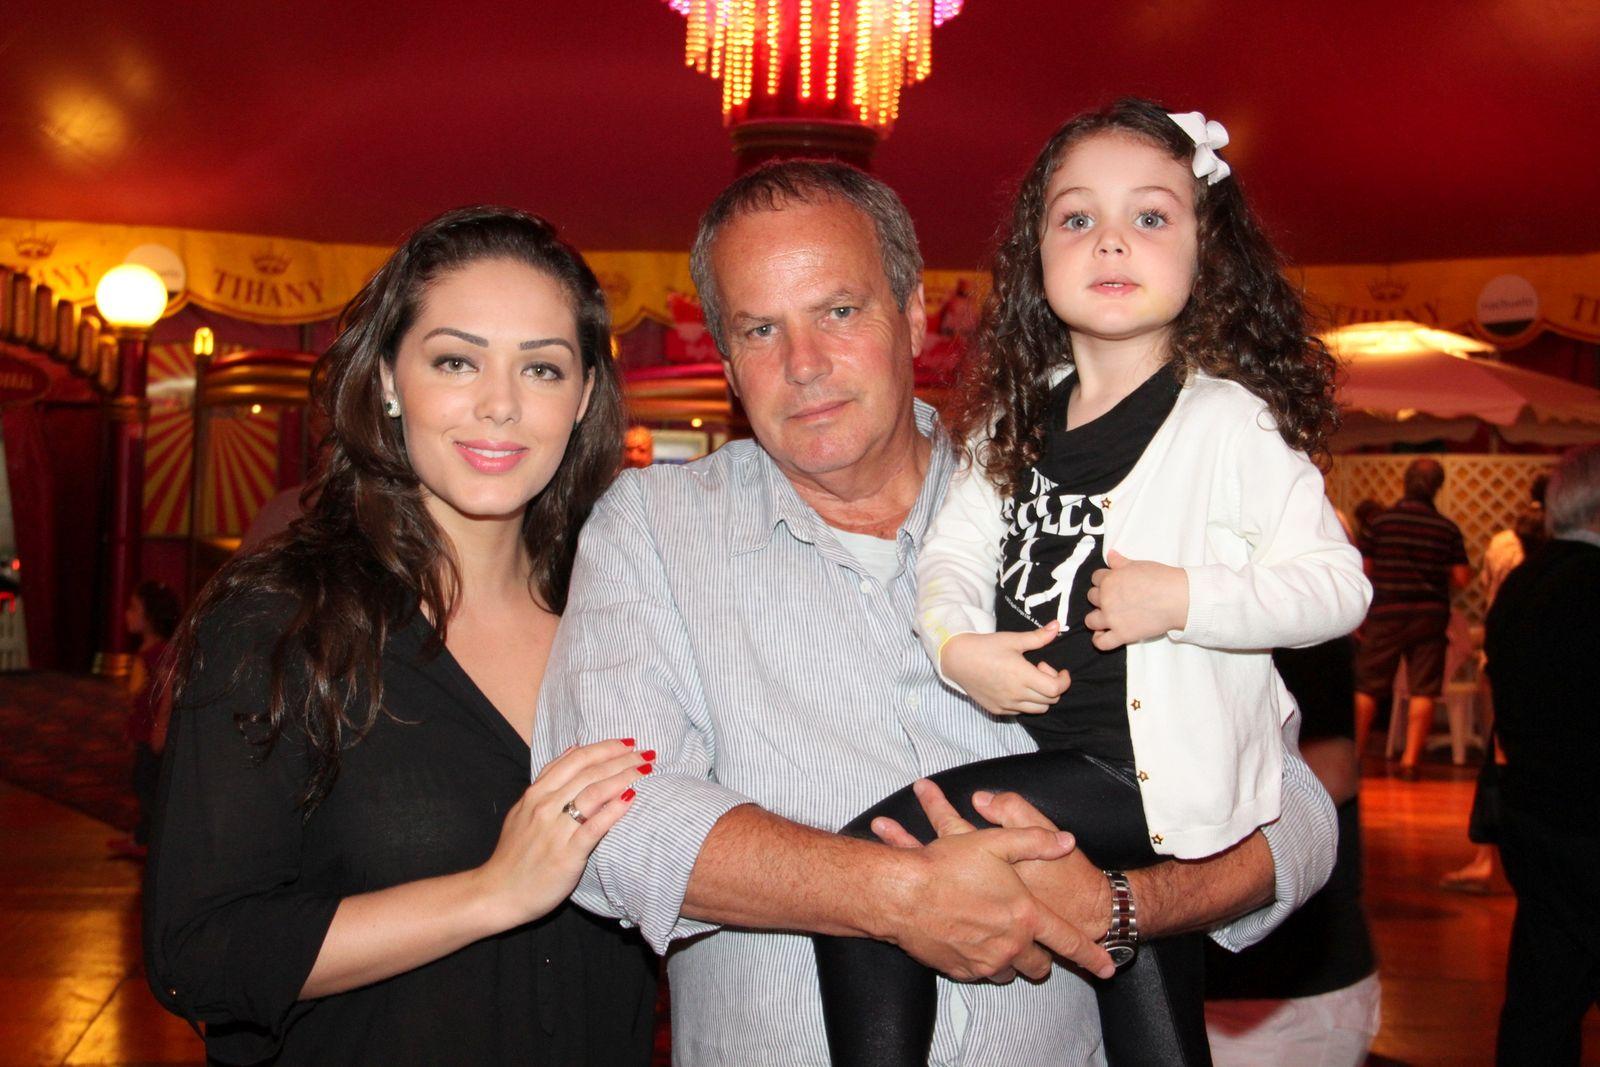 Tânia Mara sobre a filha, Maysa: